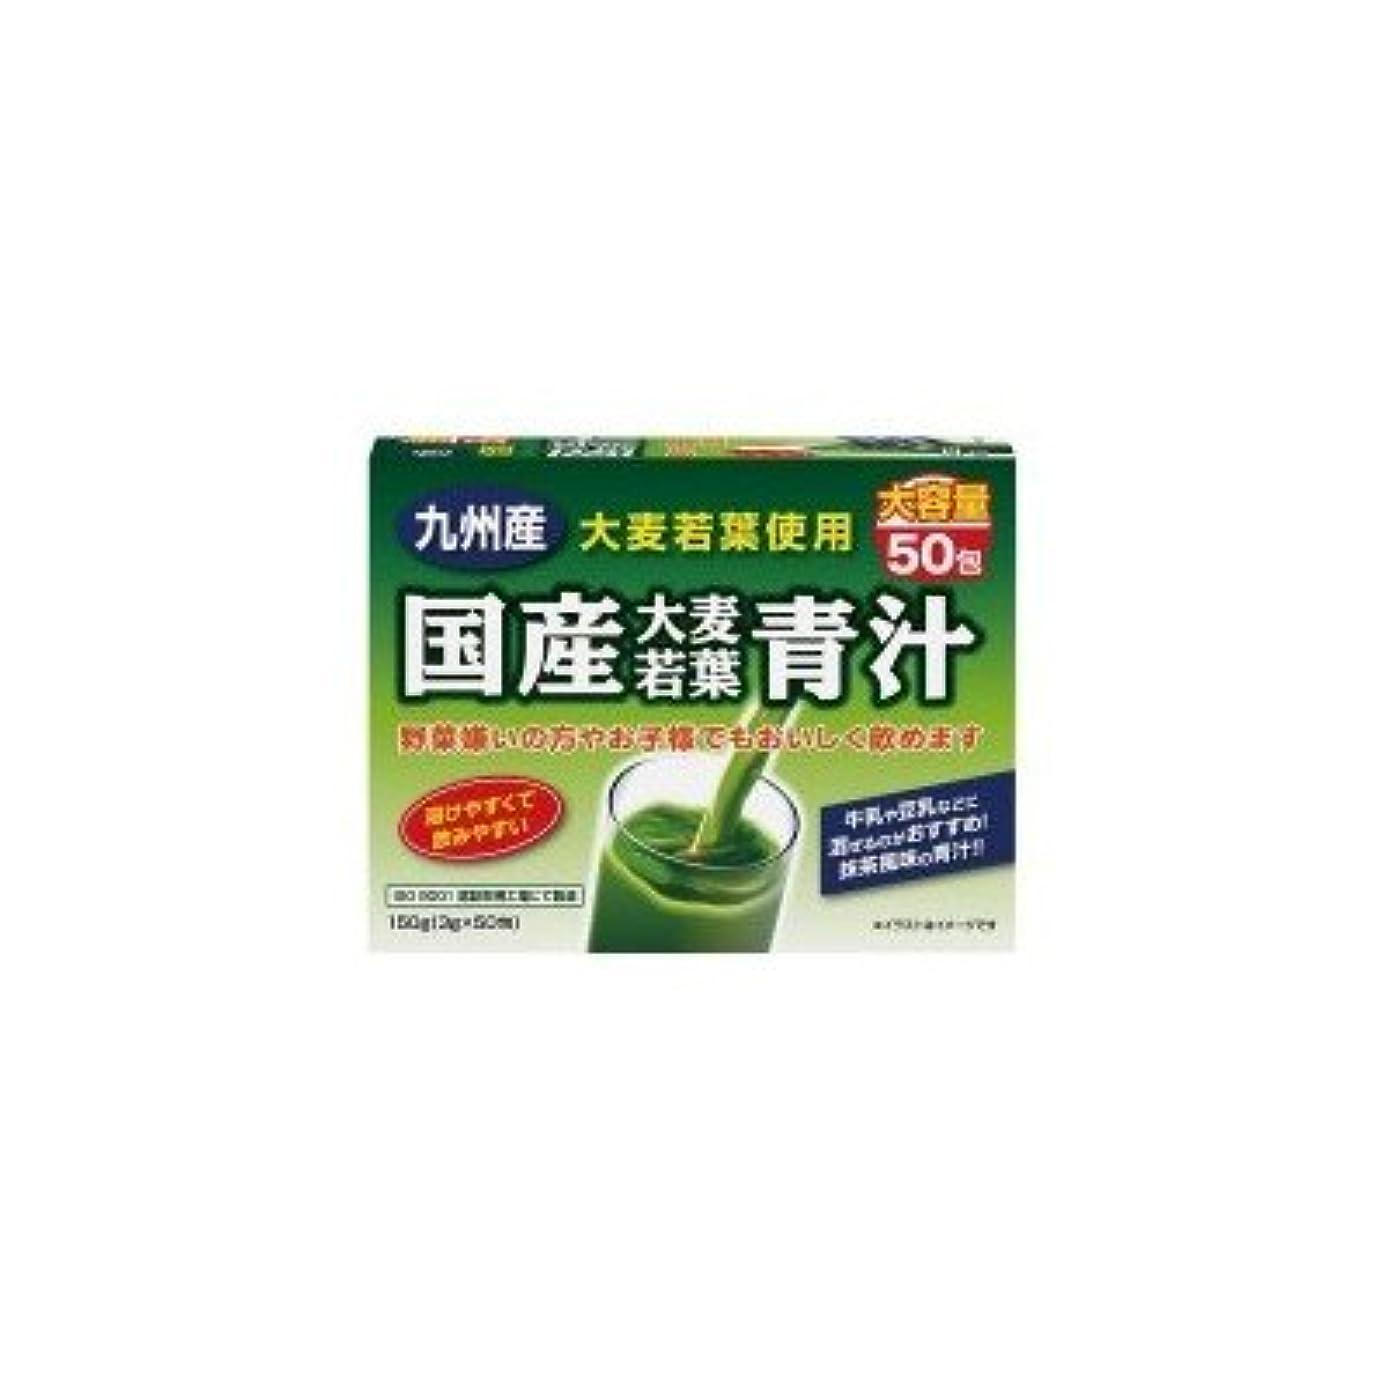 封筒毒液乏しいユーワ 九州産大麦若葉使用 国産大麦若葉青汁 150g(3g×50包) 3888